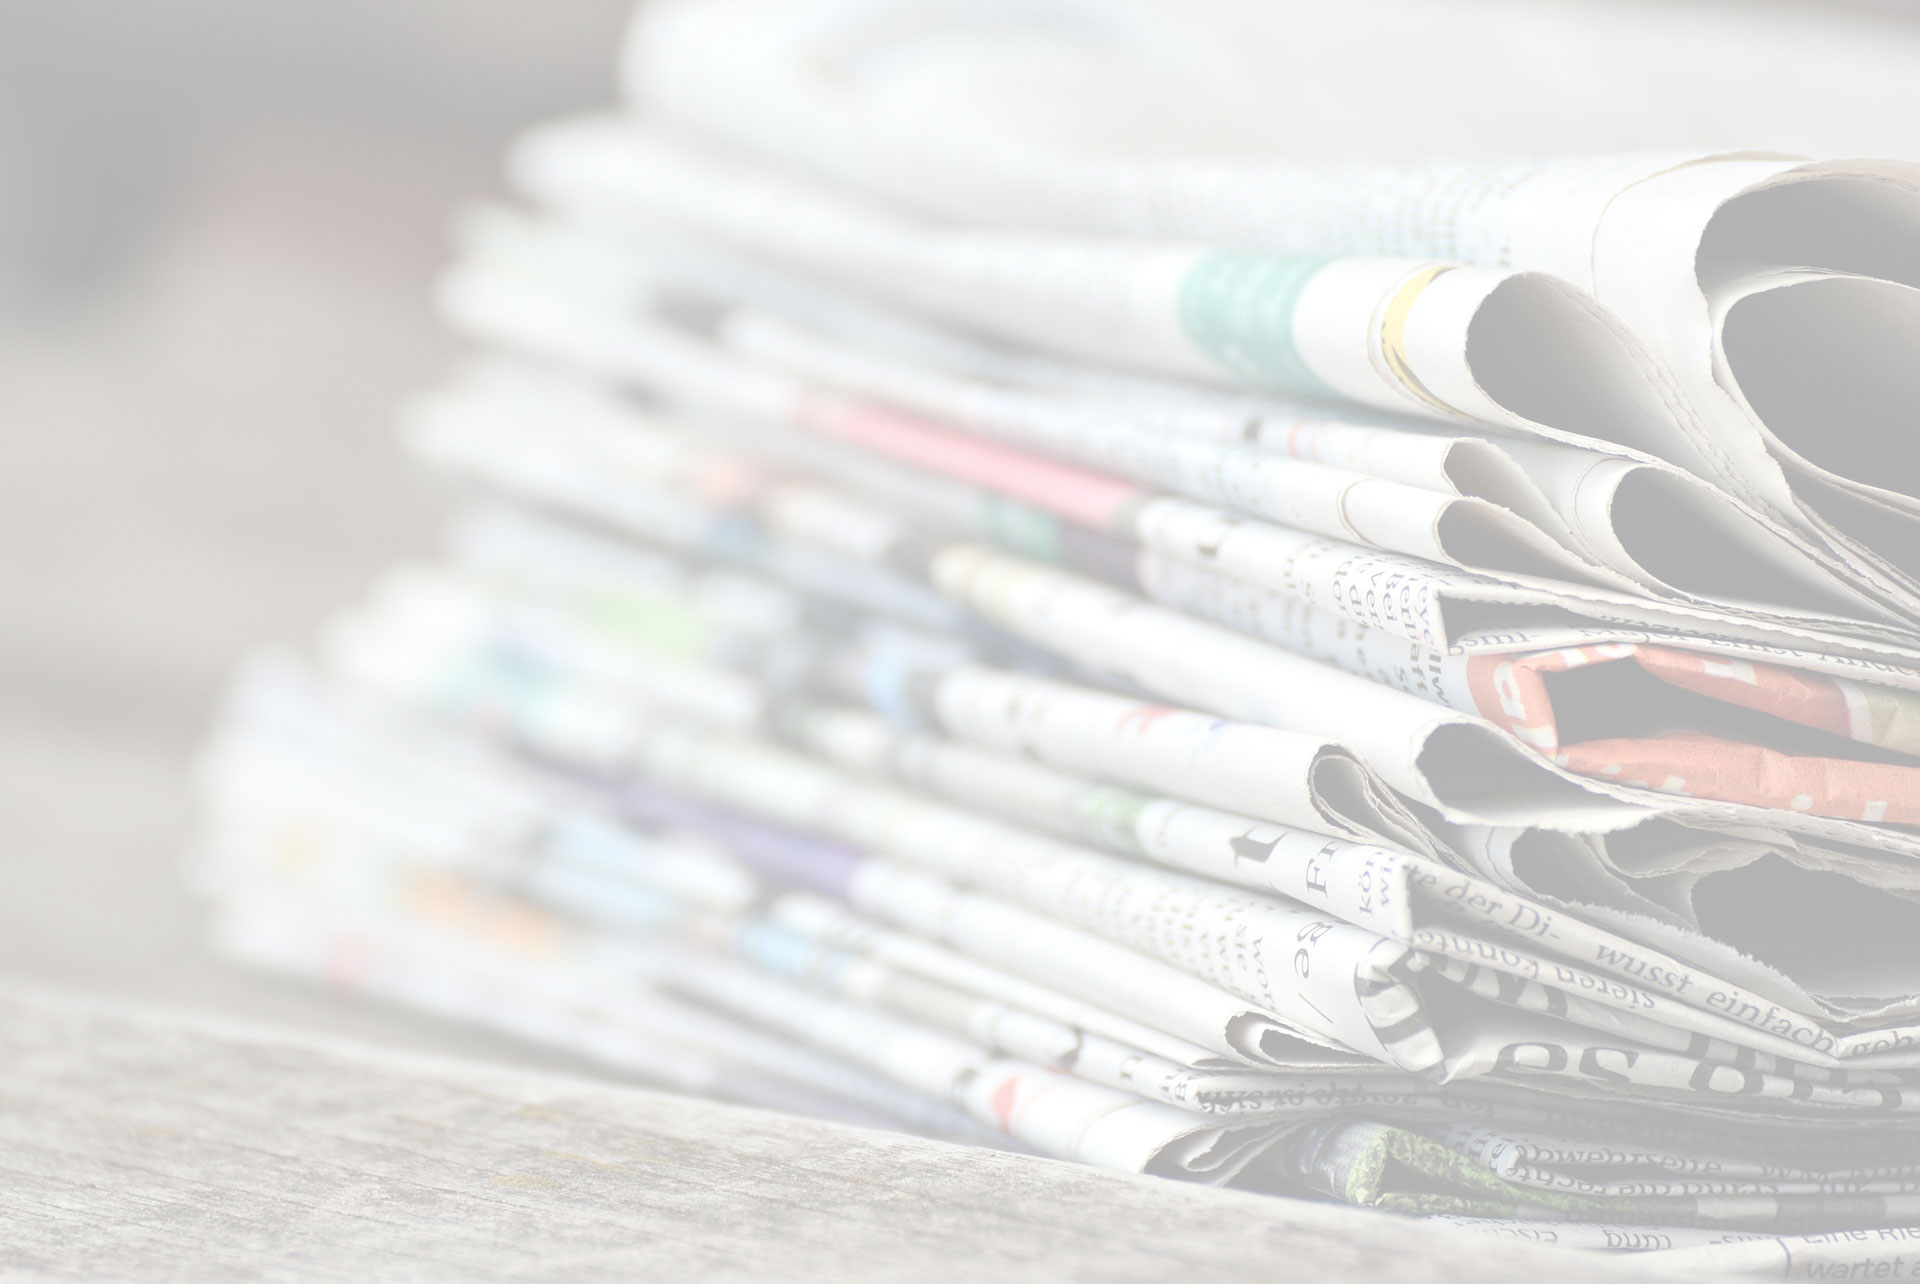 Liverpool, 1977